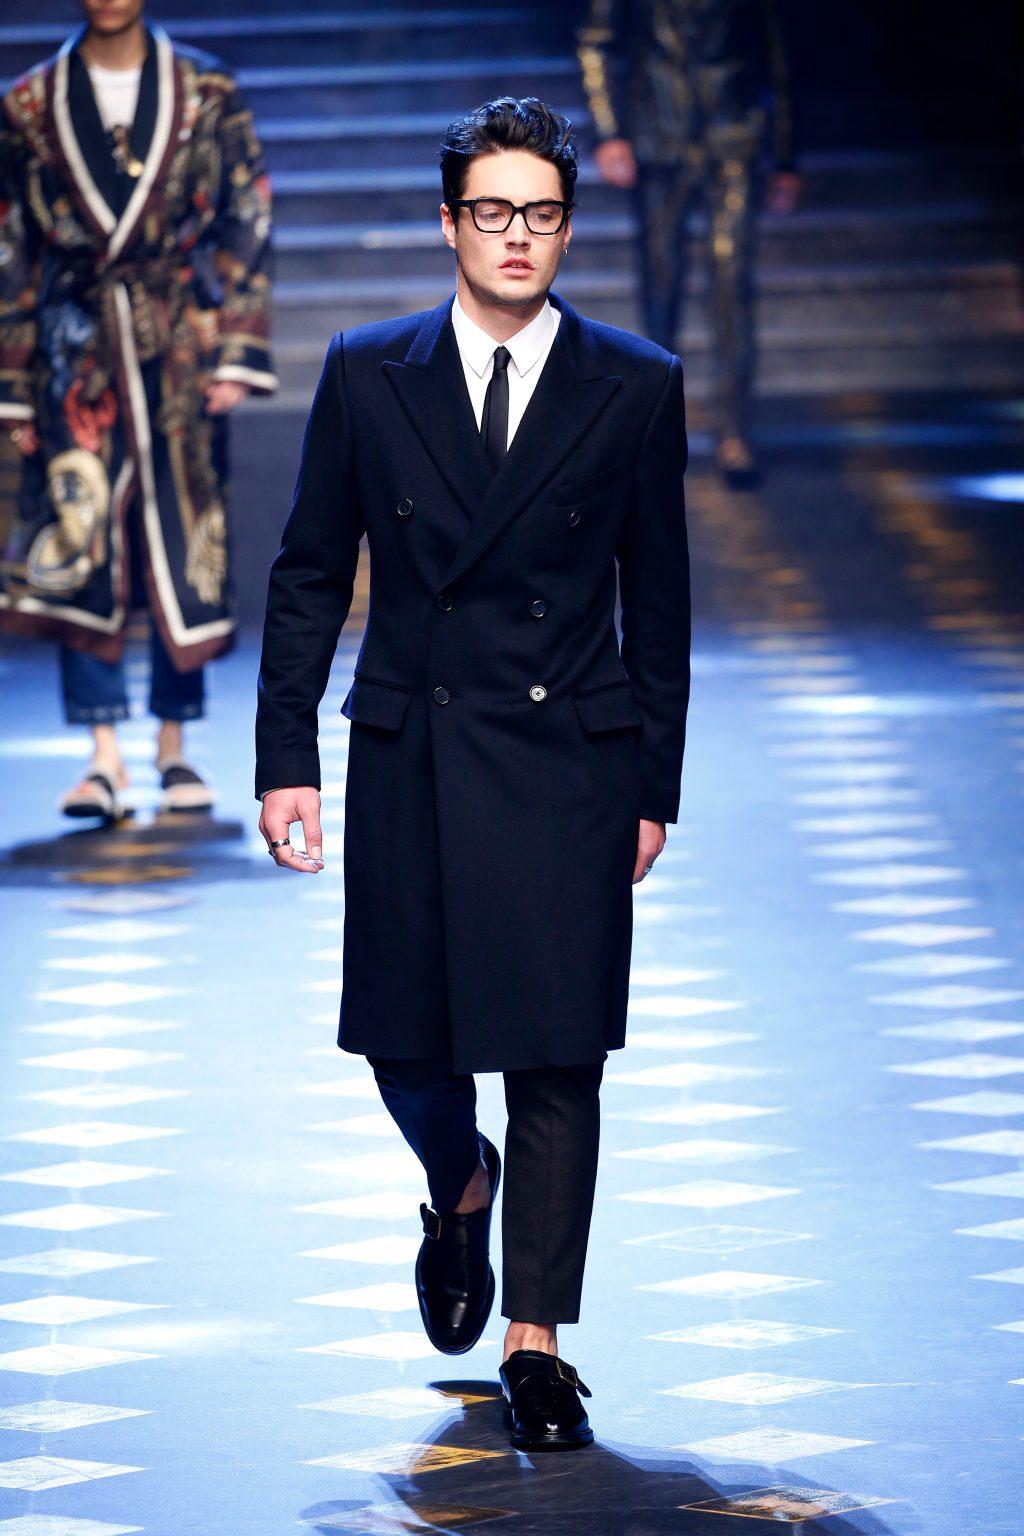 Levi Dylan walking runway for Dolce & Gabbana